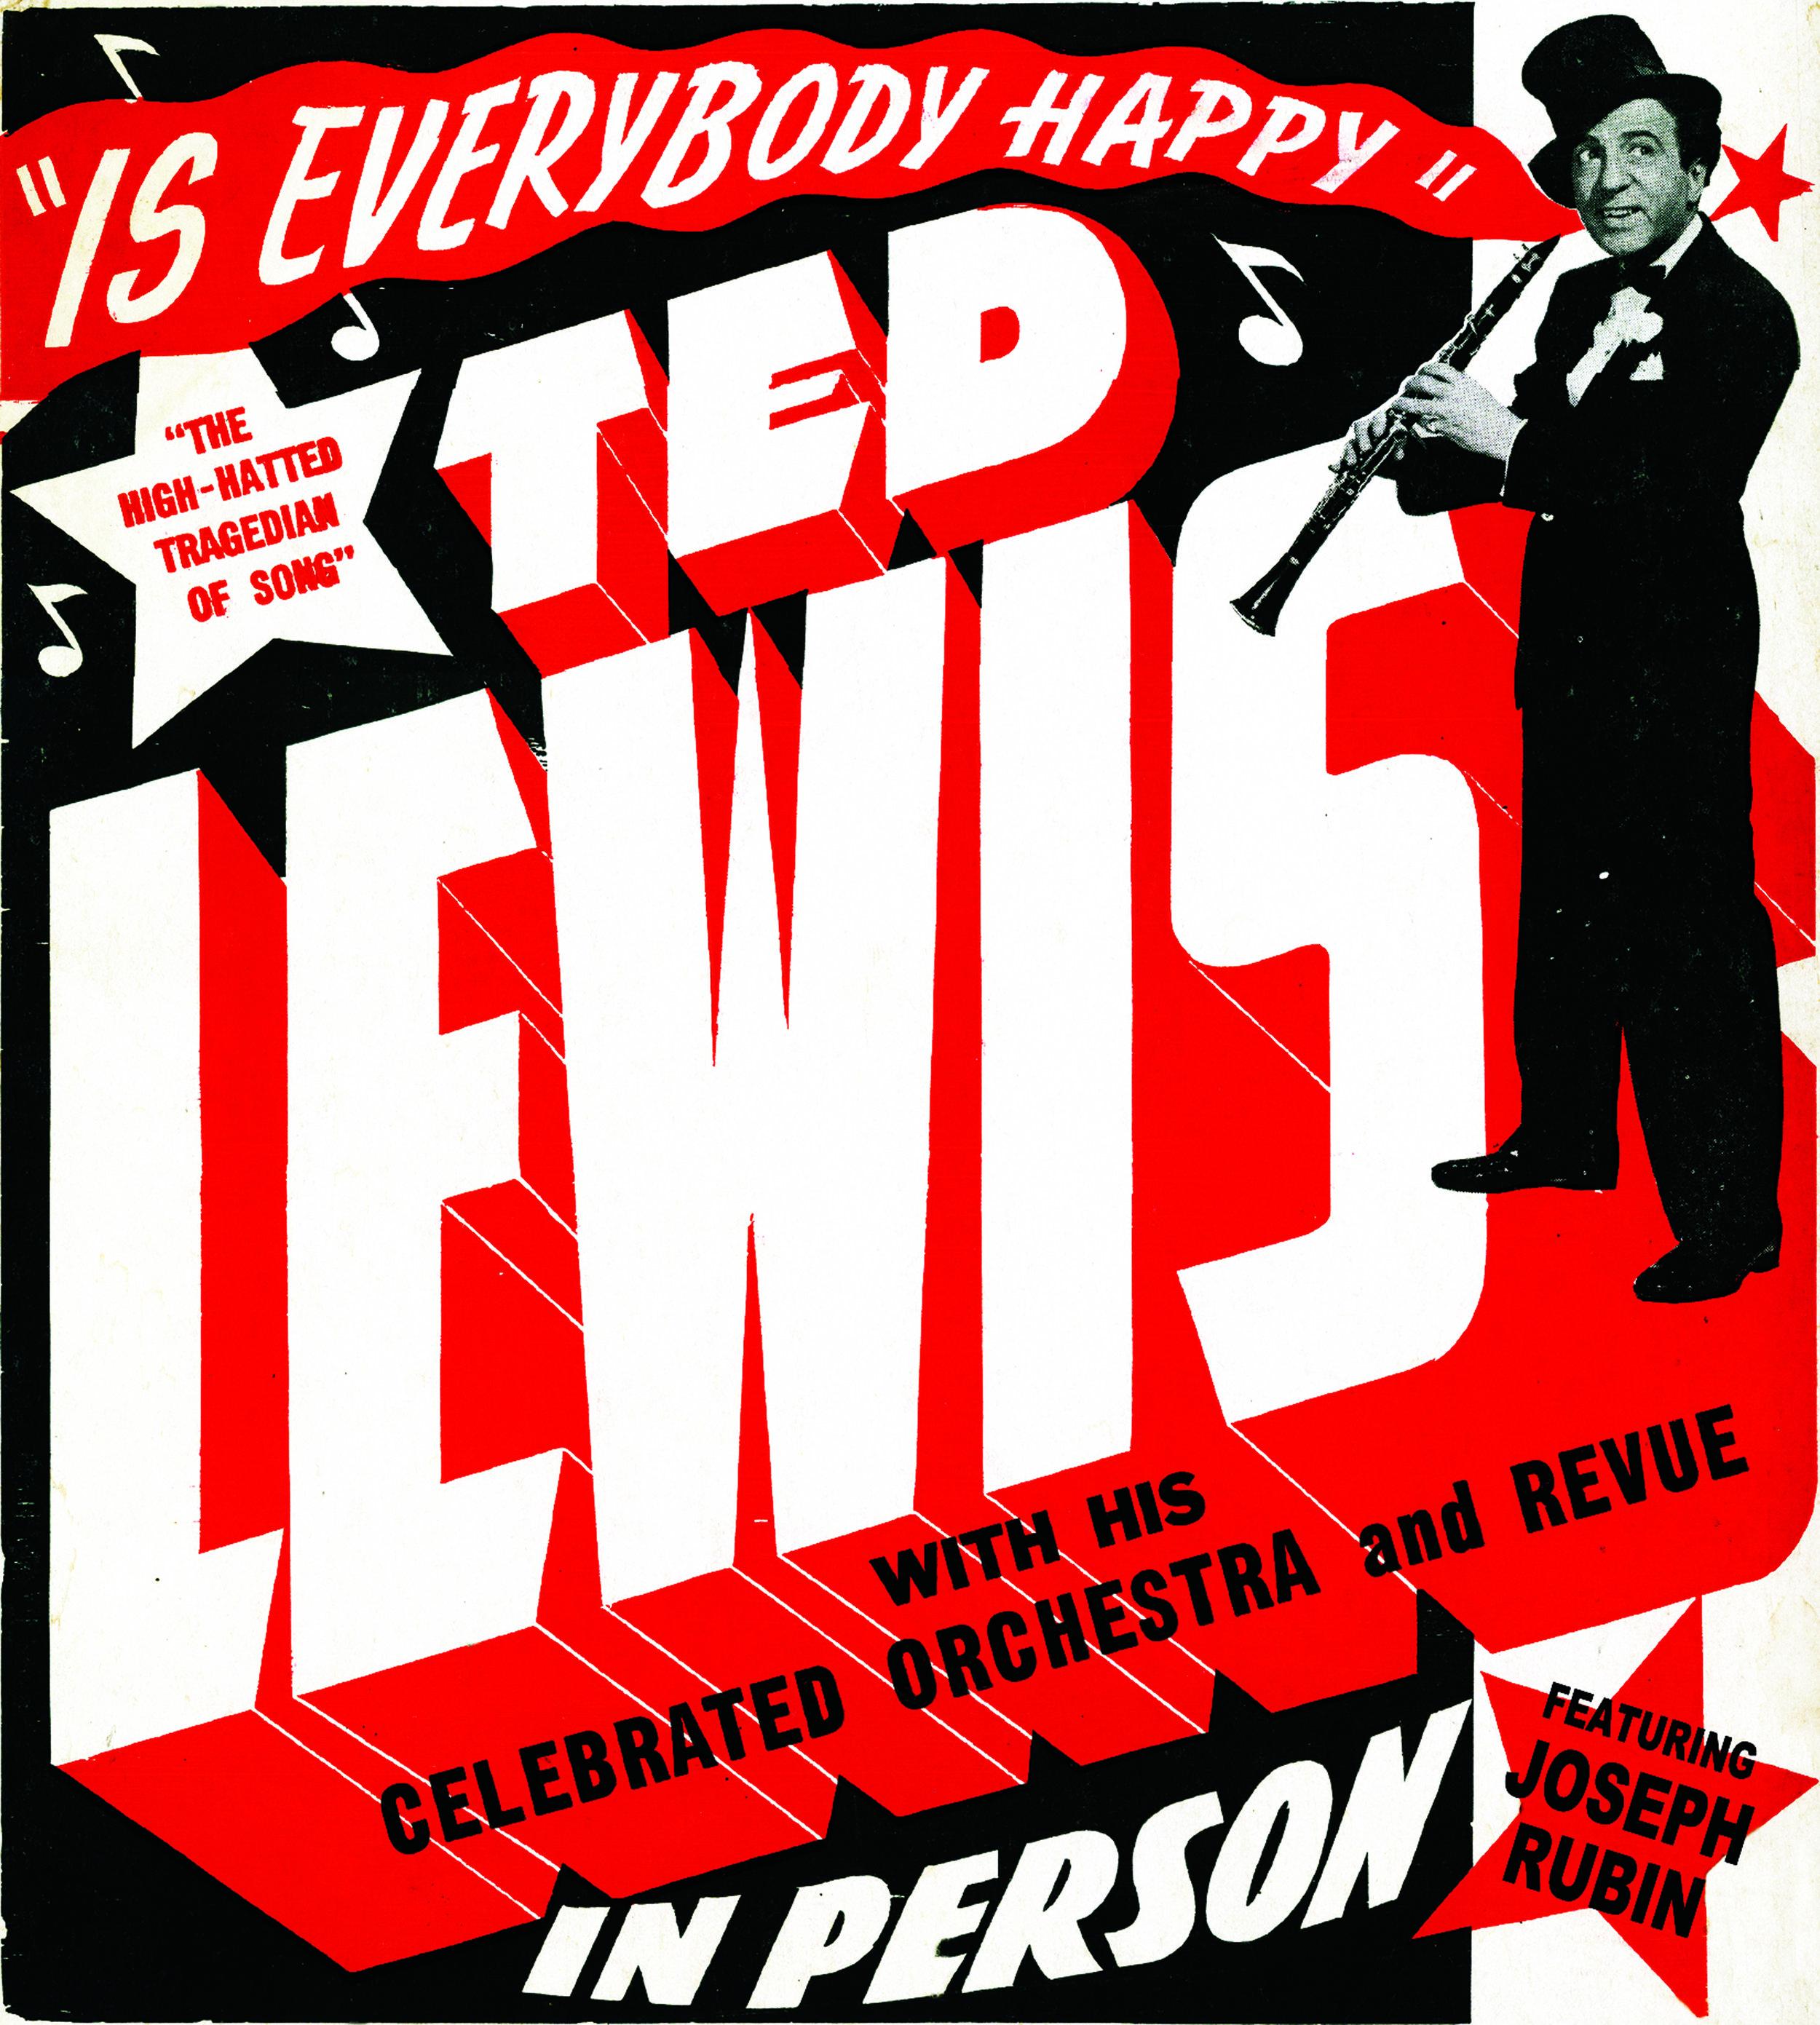 Ted Lewis Poster image web.jpg